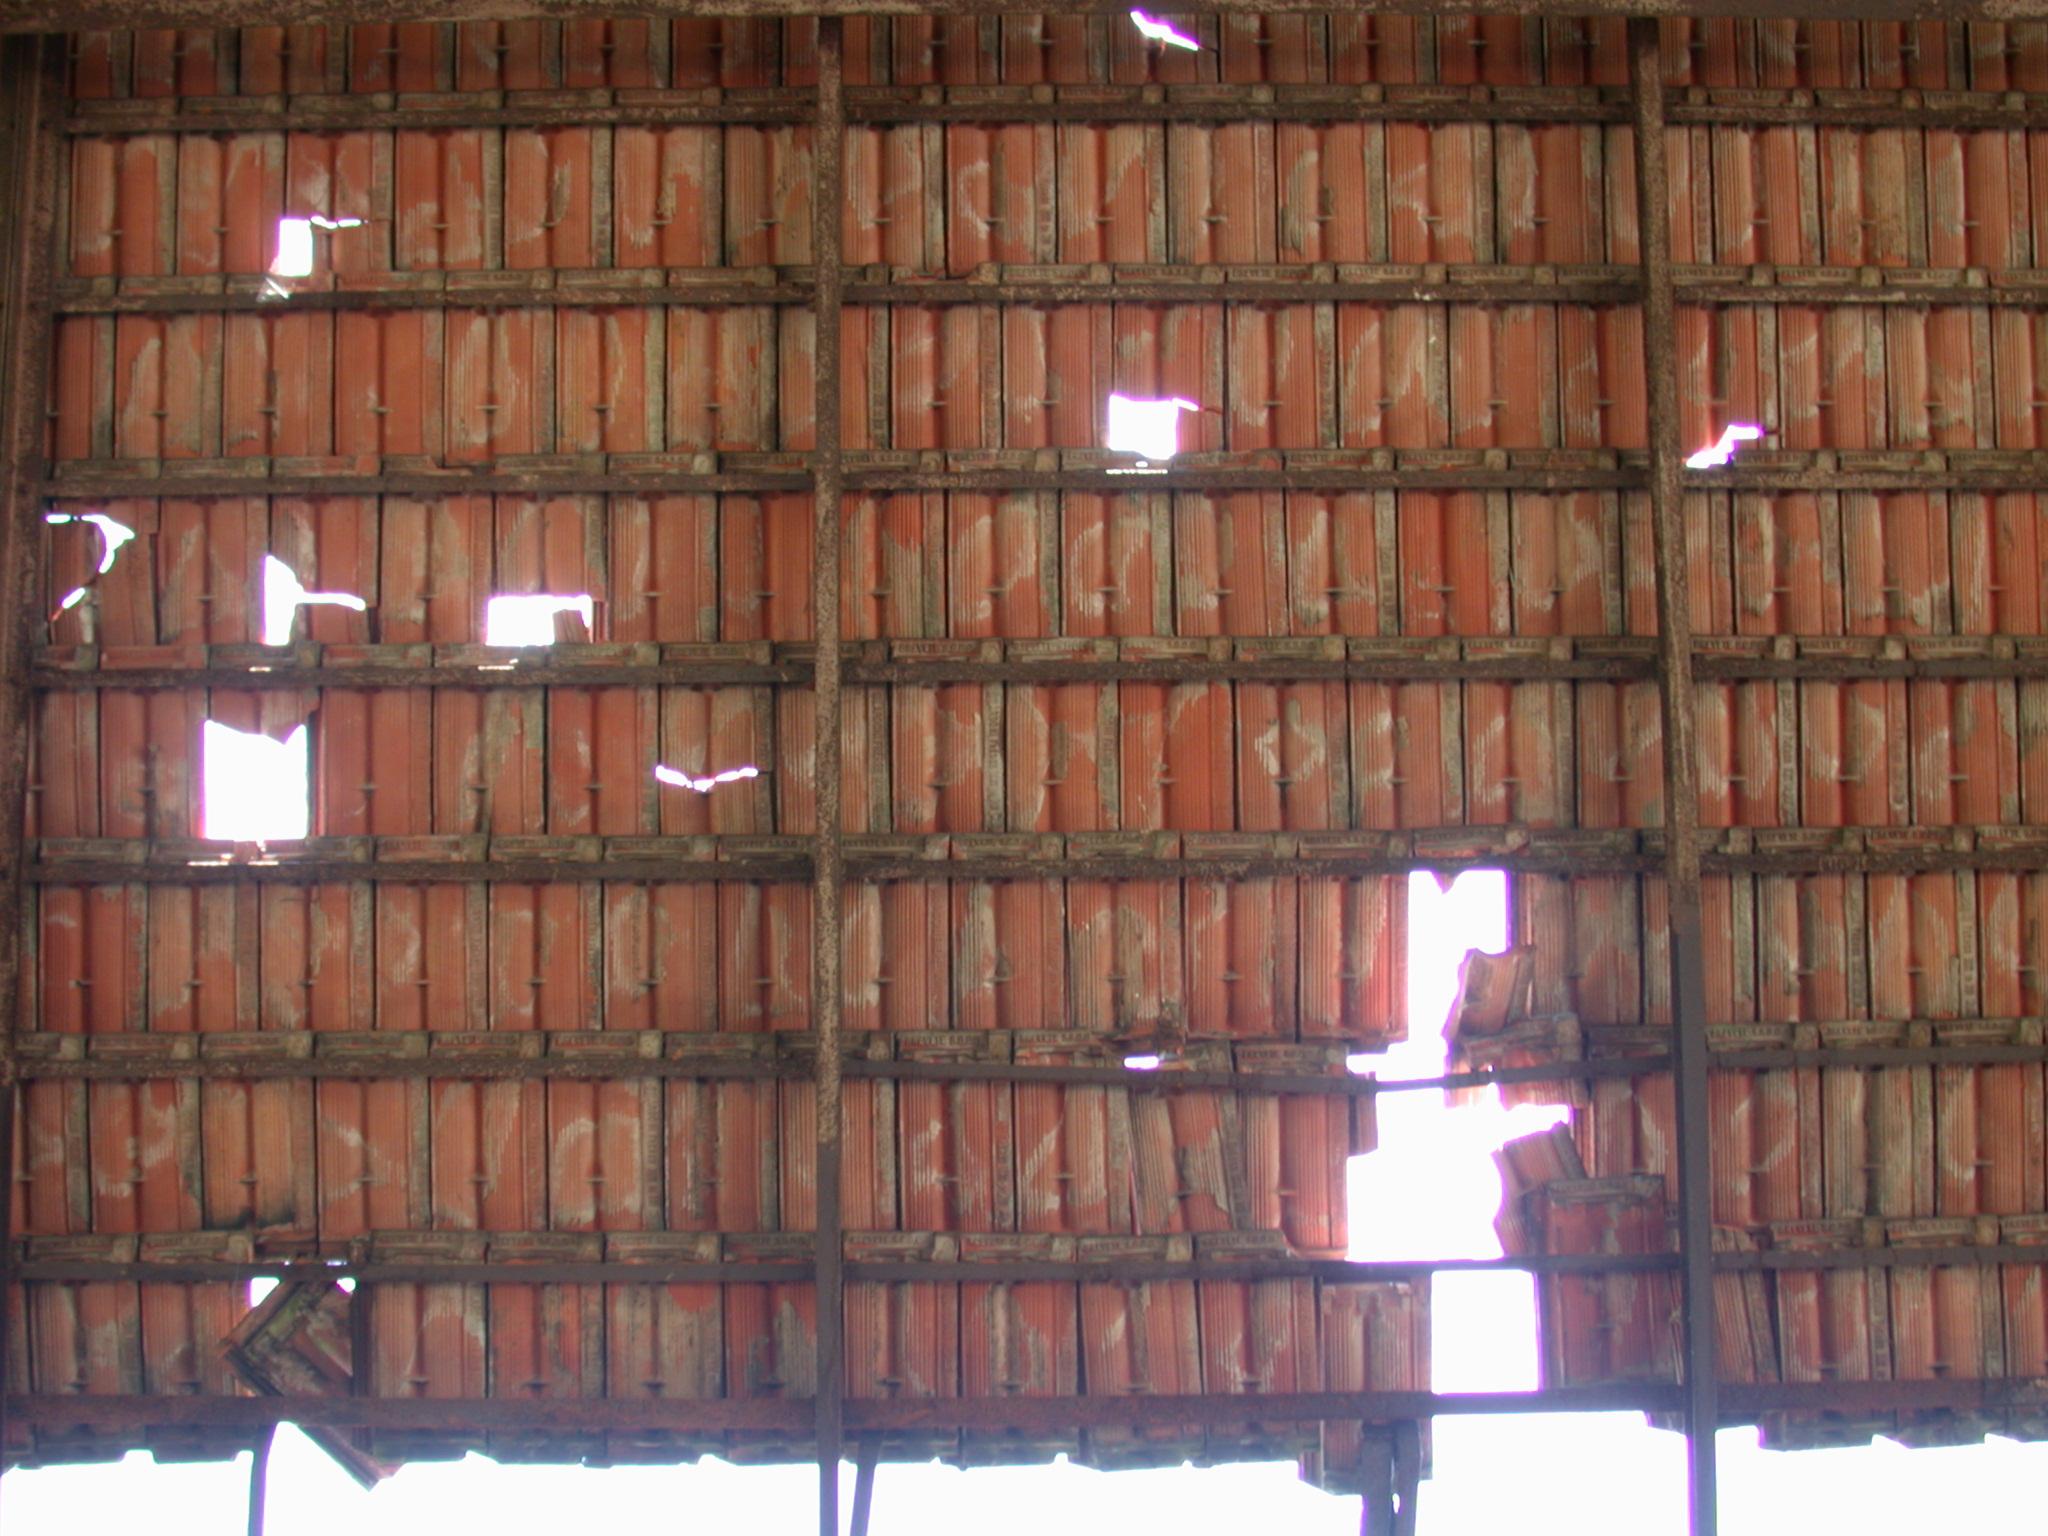 wall hut african holes bamboo sun shining